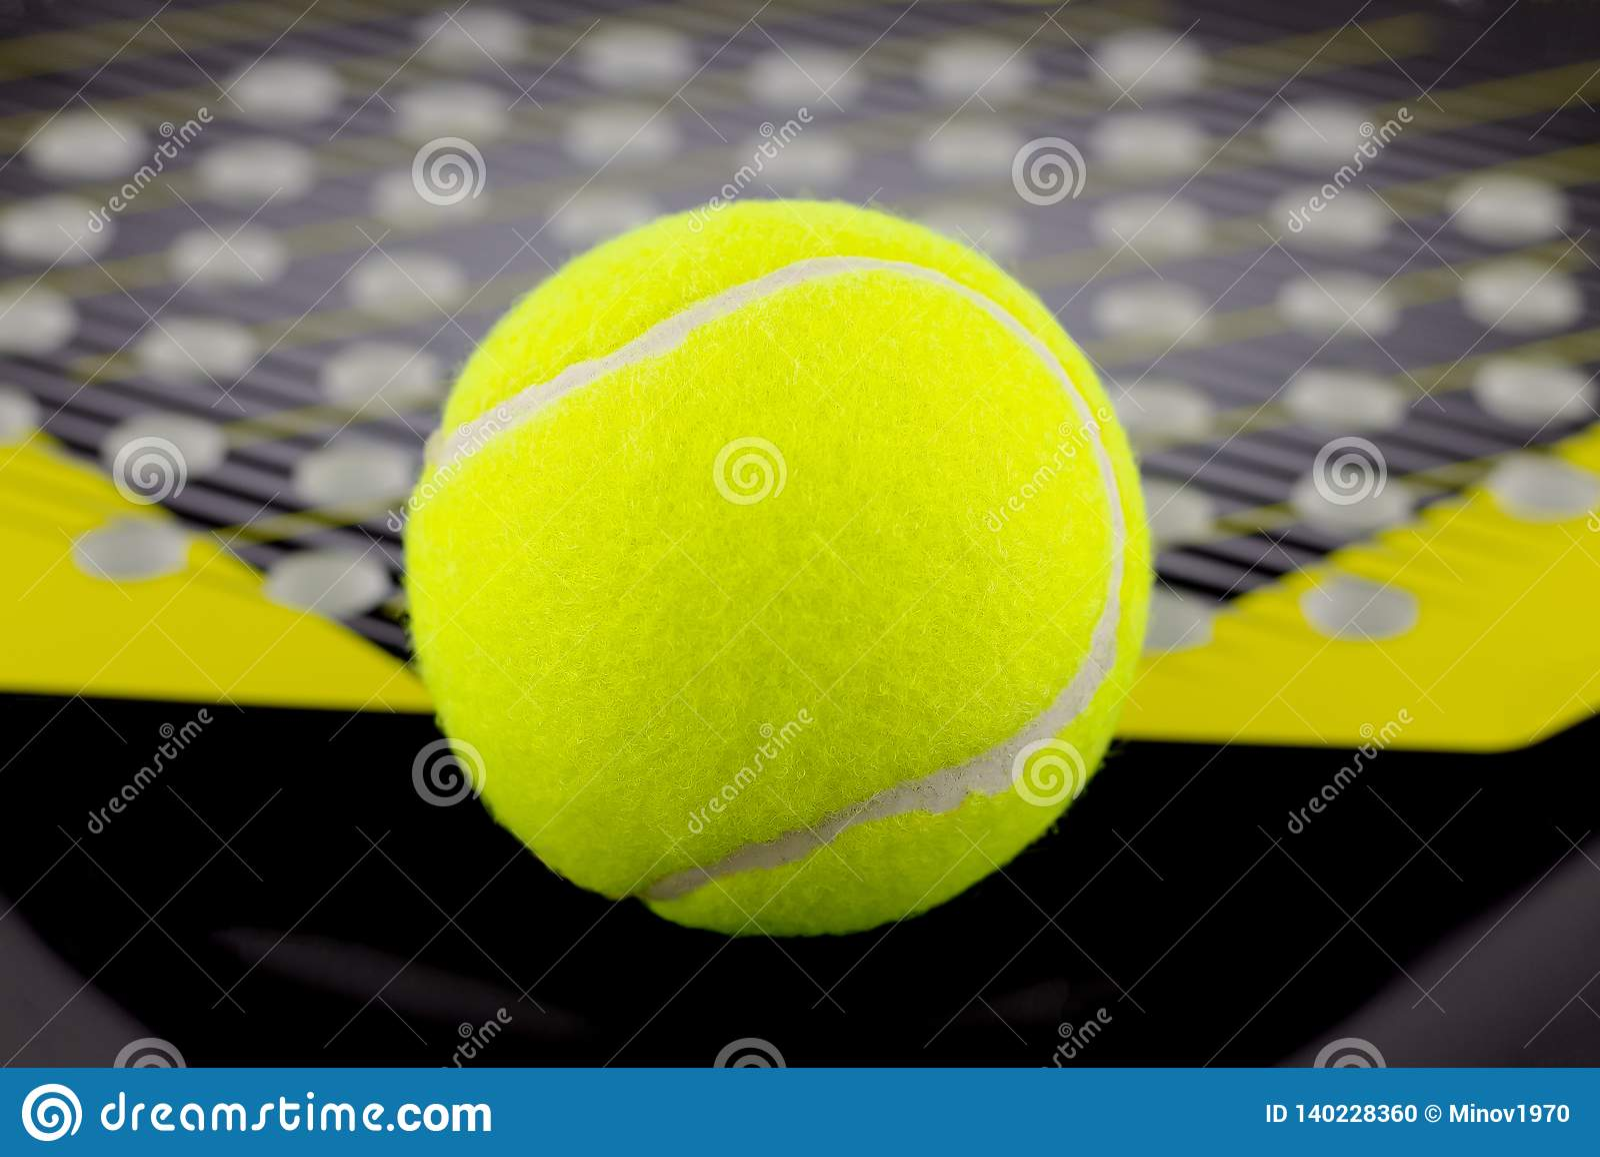 The tennis ball lies on a racket for playing beach tennis